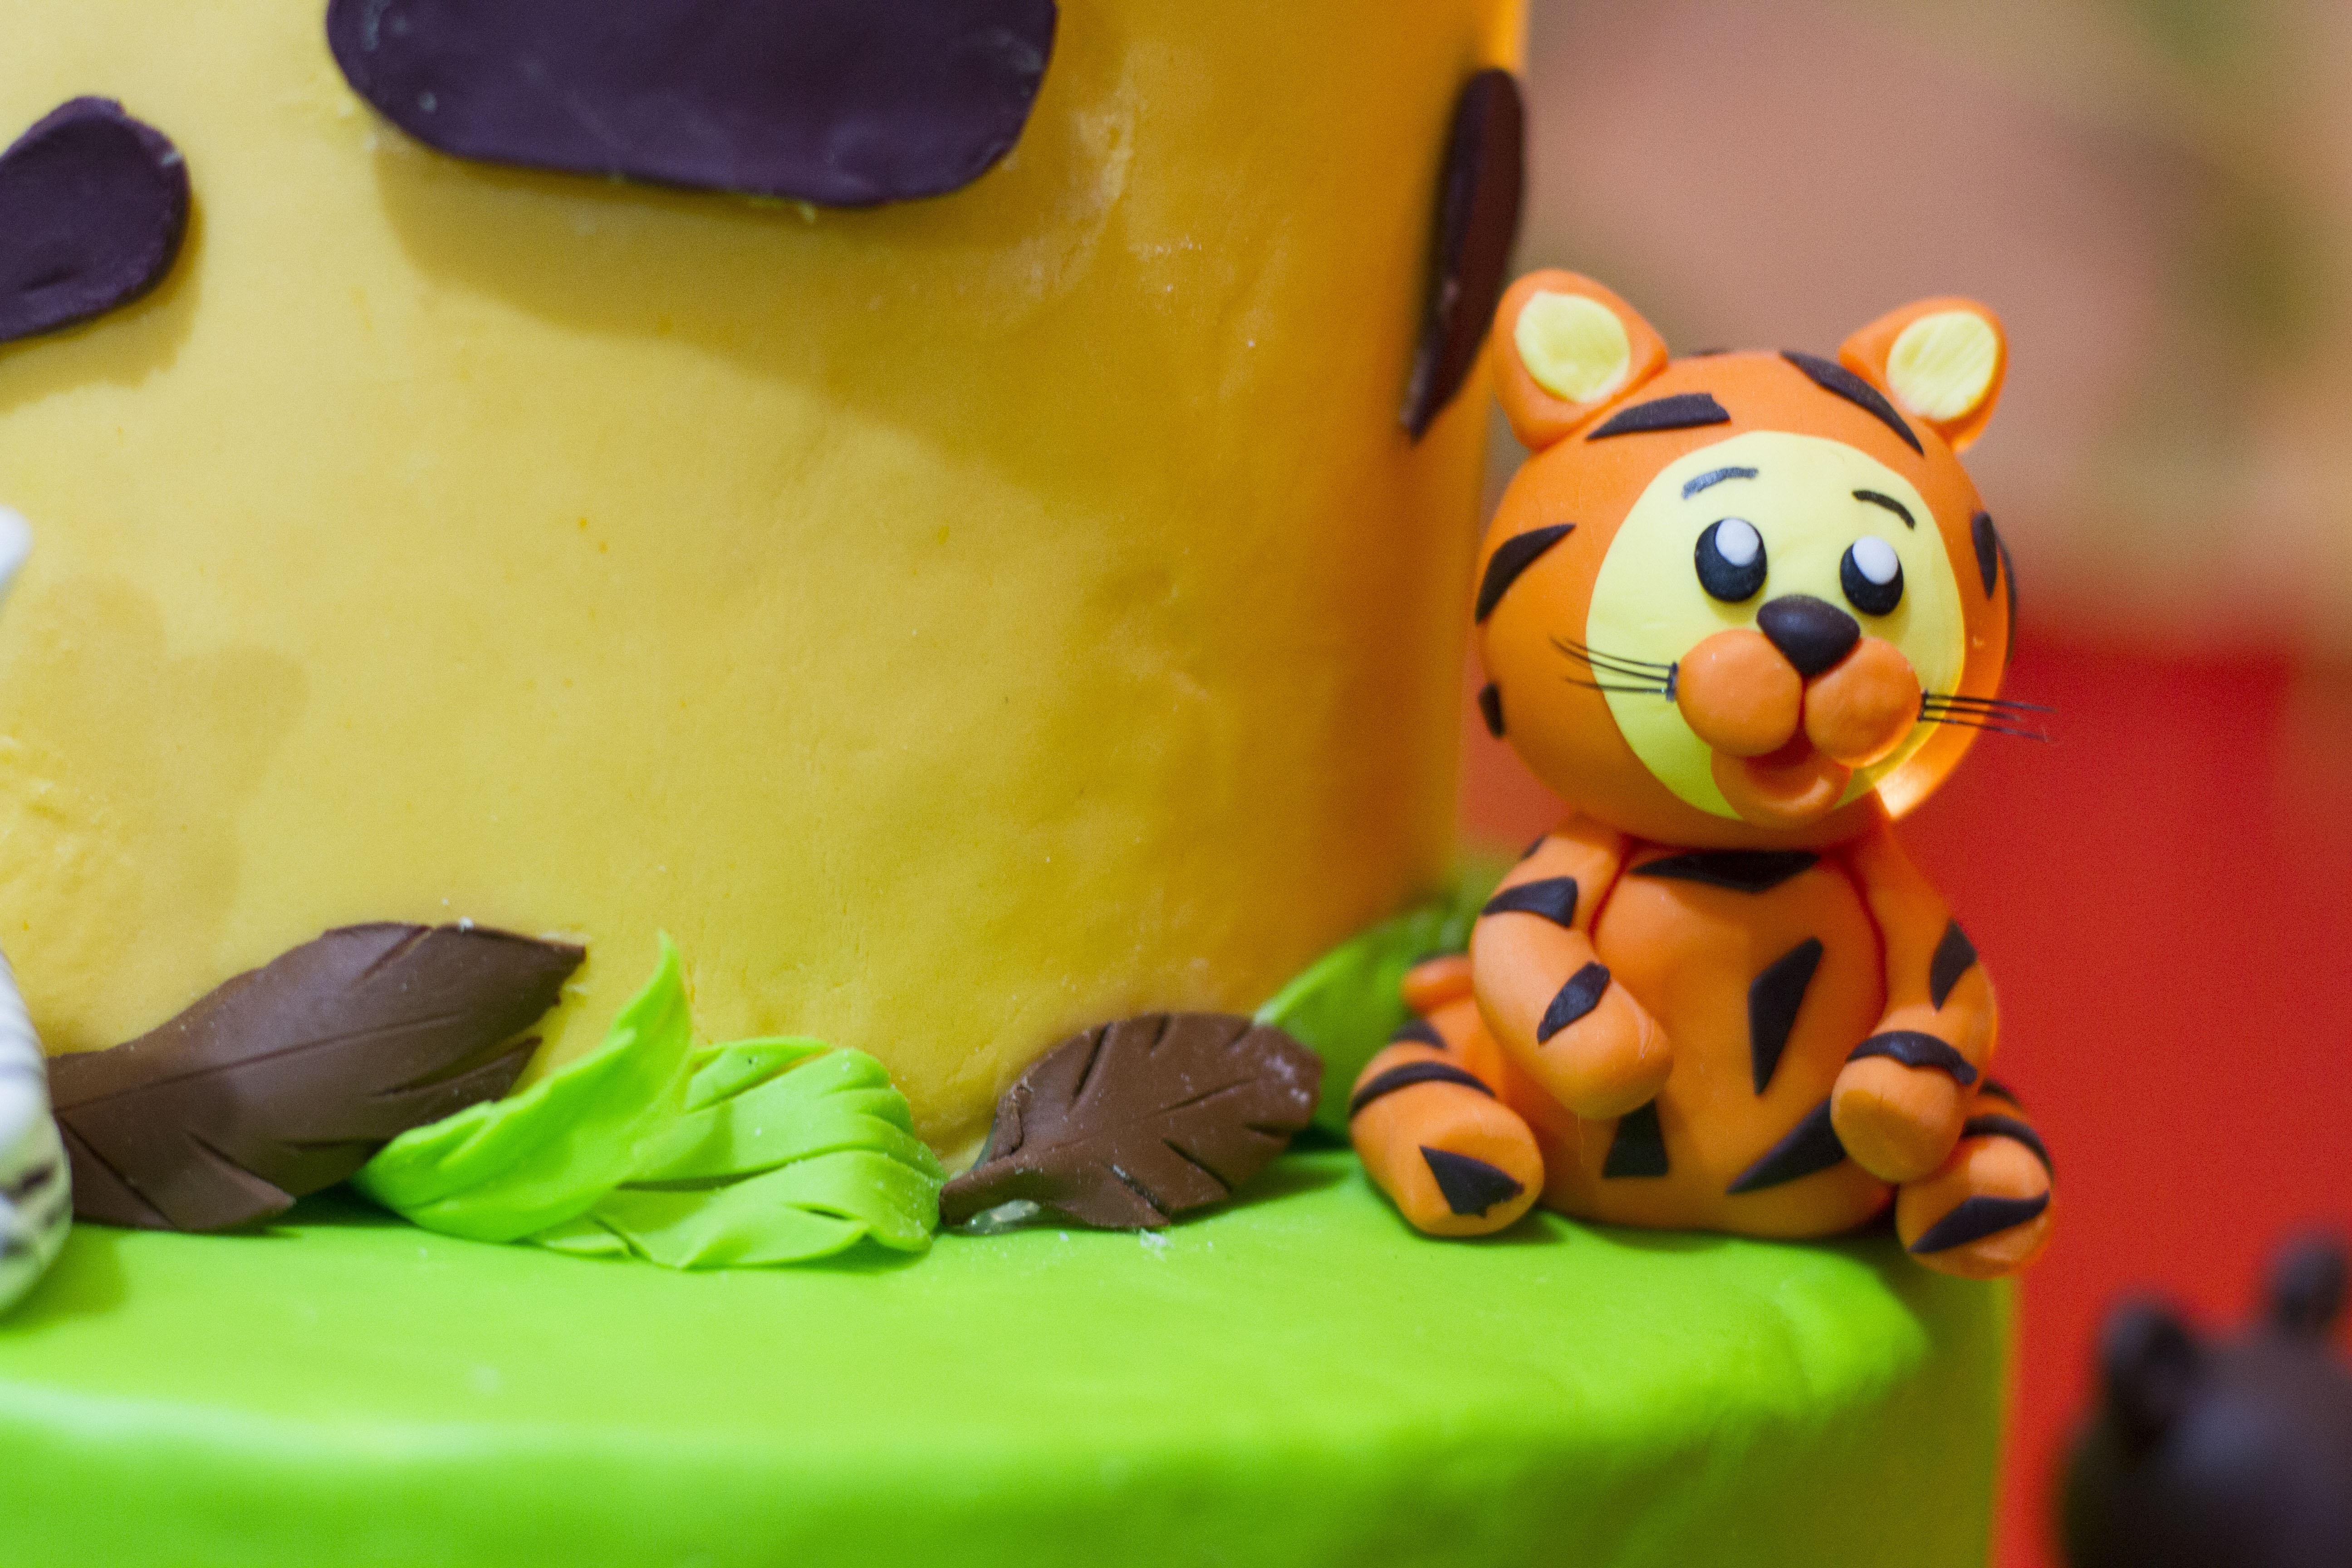 Free Images Zoo Food Green Biscuit Dessert Cuisine Birthday